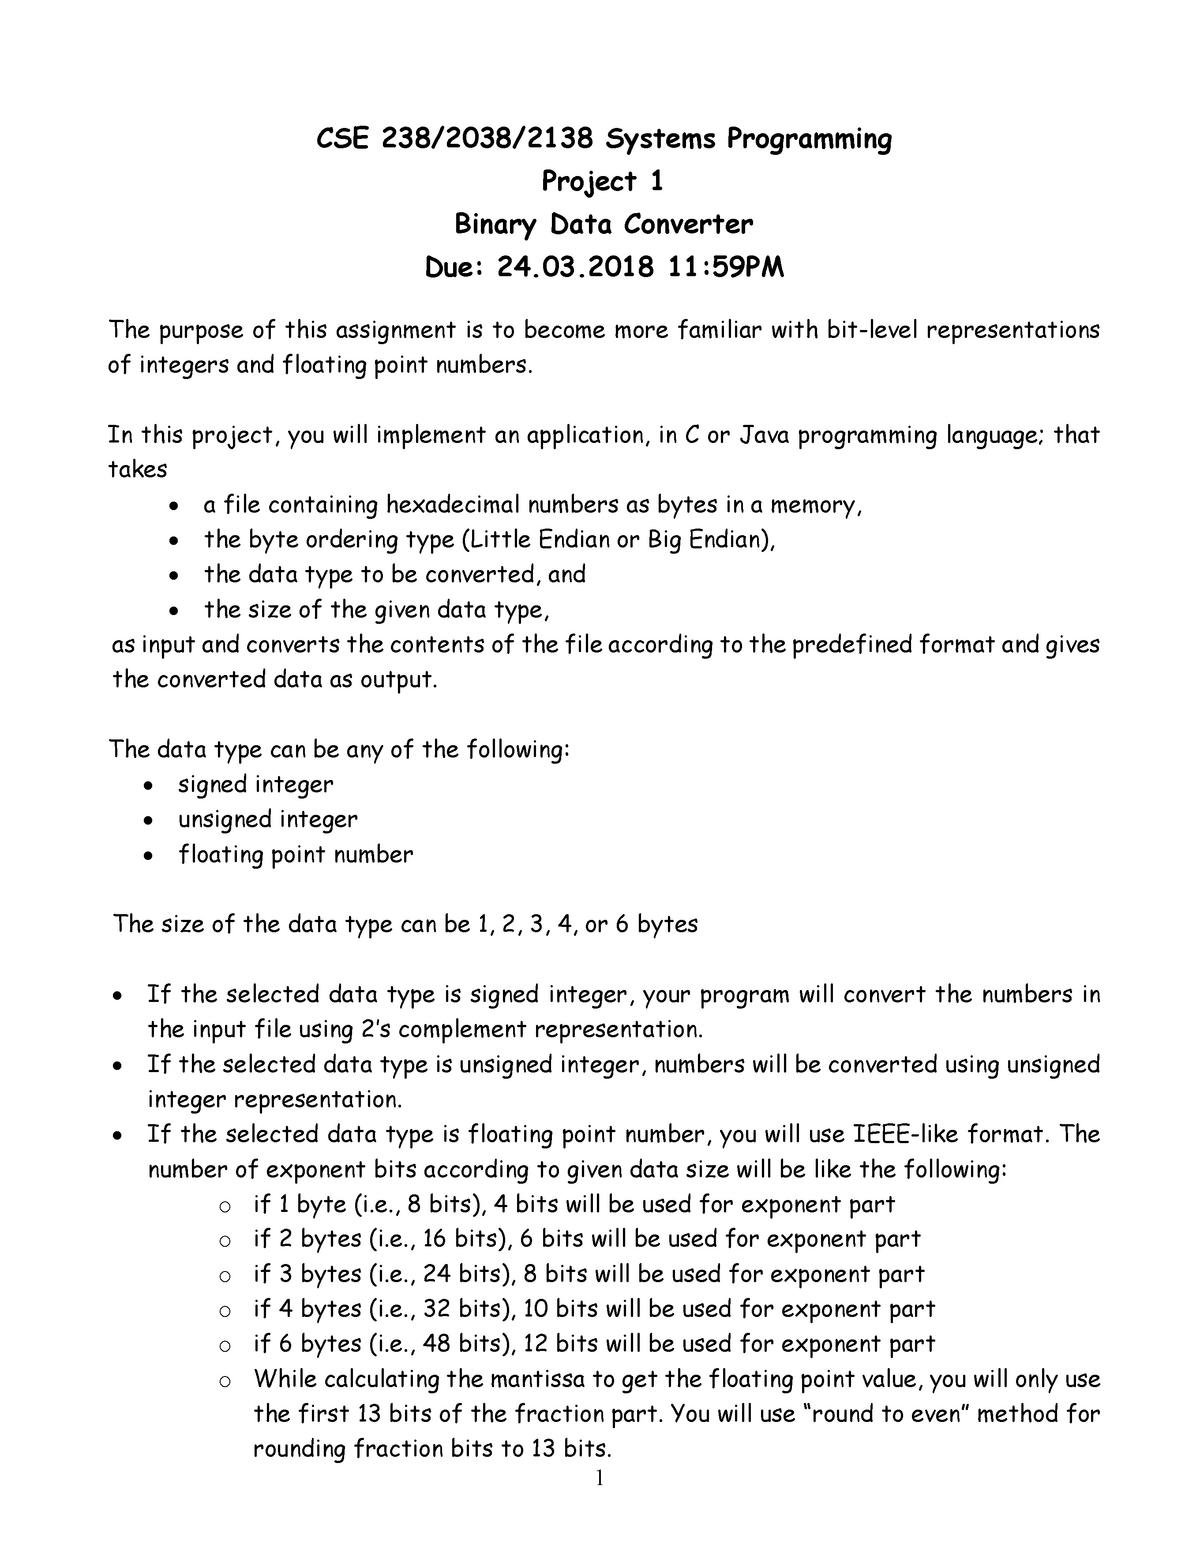 Binary data converter - Discrete Mathematics CSE2023 - StuDocu